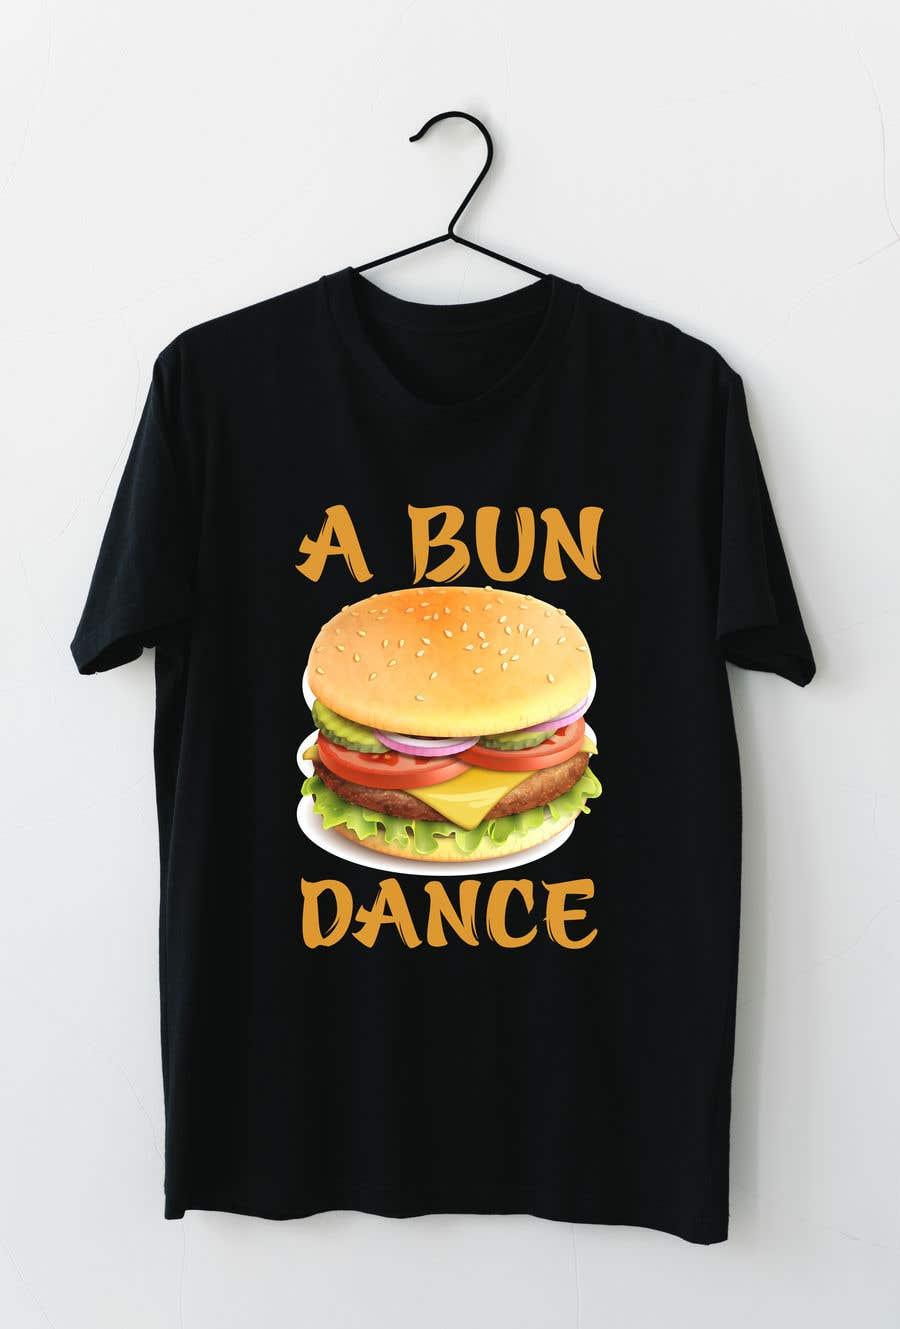 Bài tham dự cuộc thi #                                        14                                      cho                                         A Bun Dance Graphic Design T-Shirt